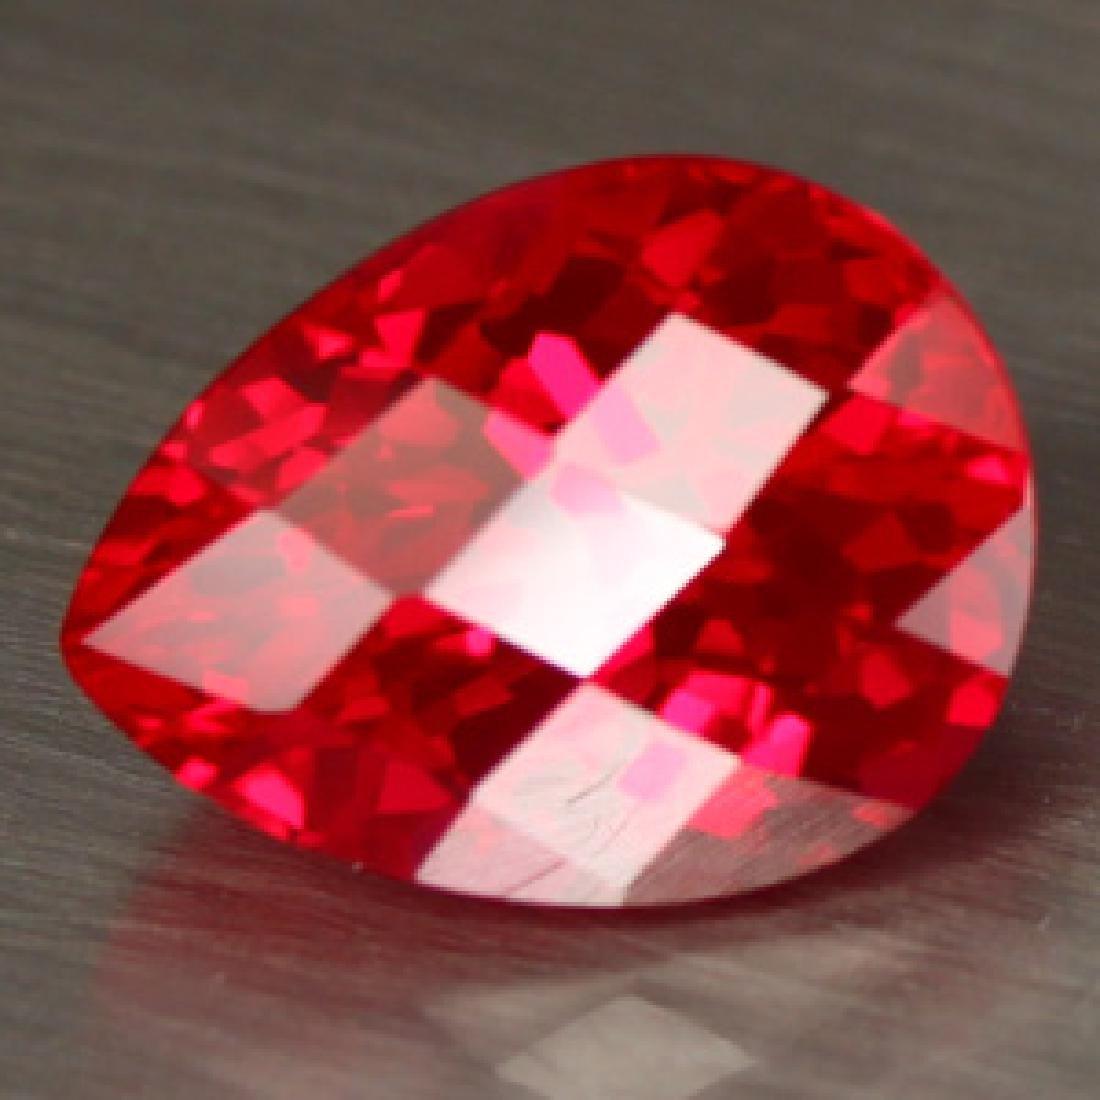 Natural Red Topaz 17.86 Carats - VVS